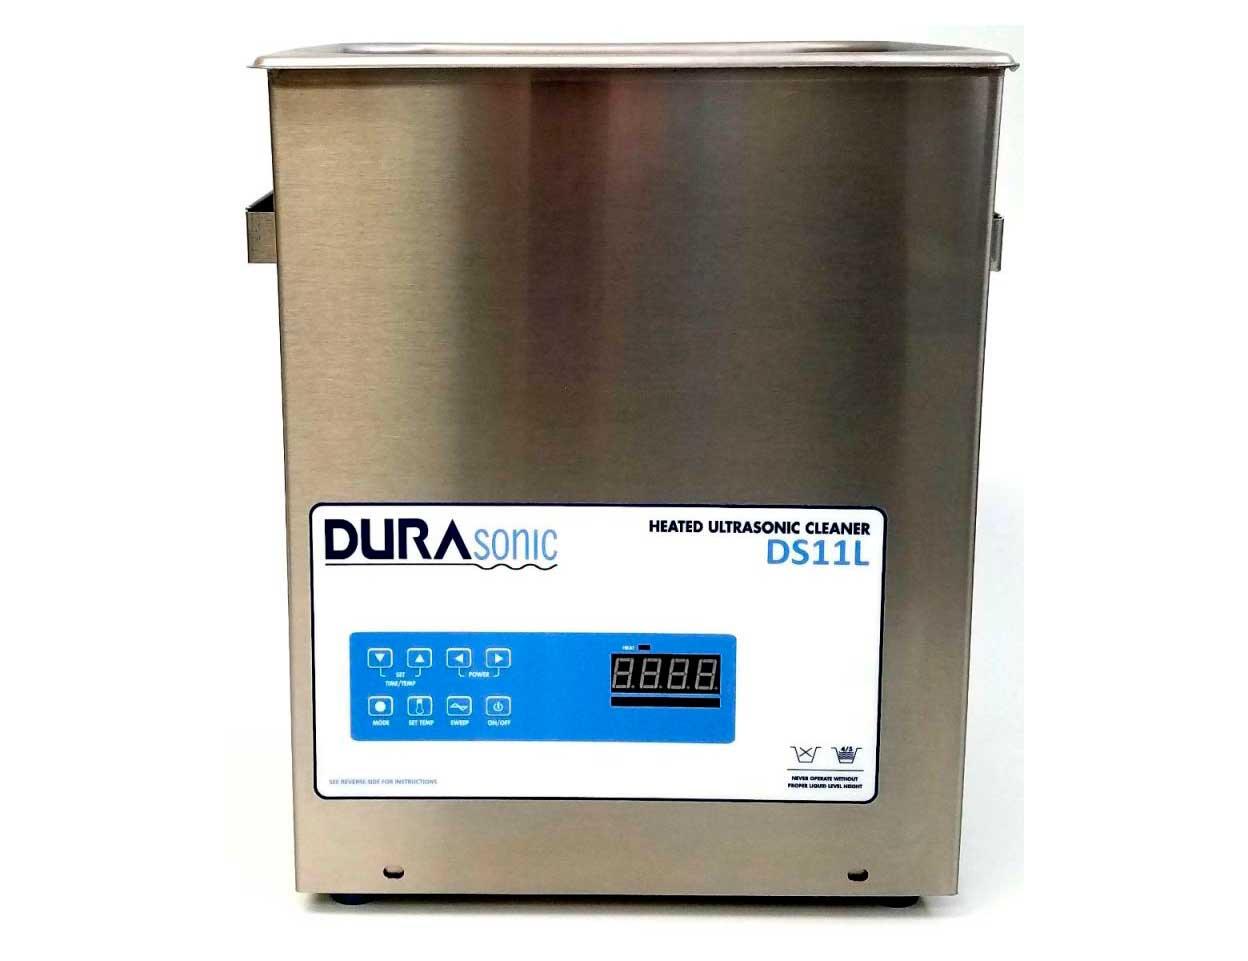 DuraSonic 3 Gal Digital Ultrasonic Cleaner